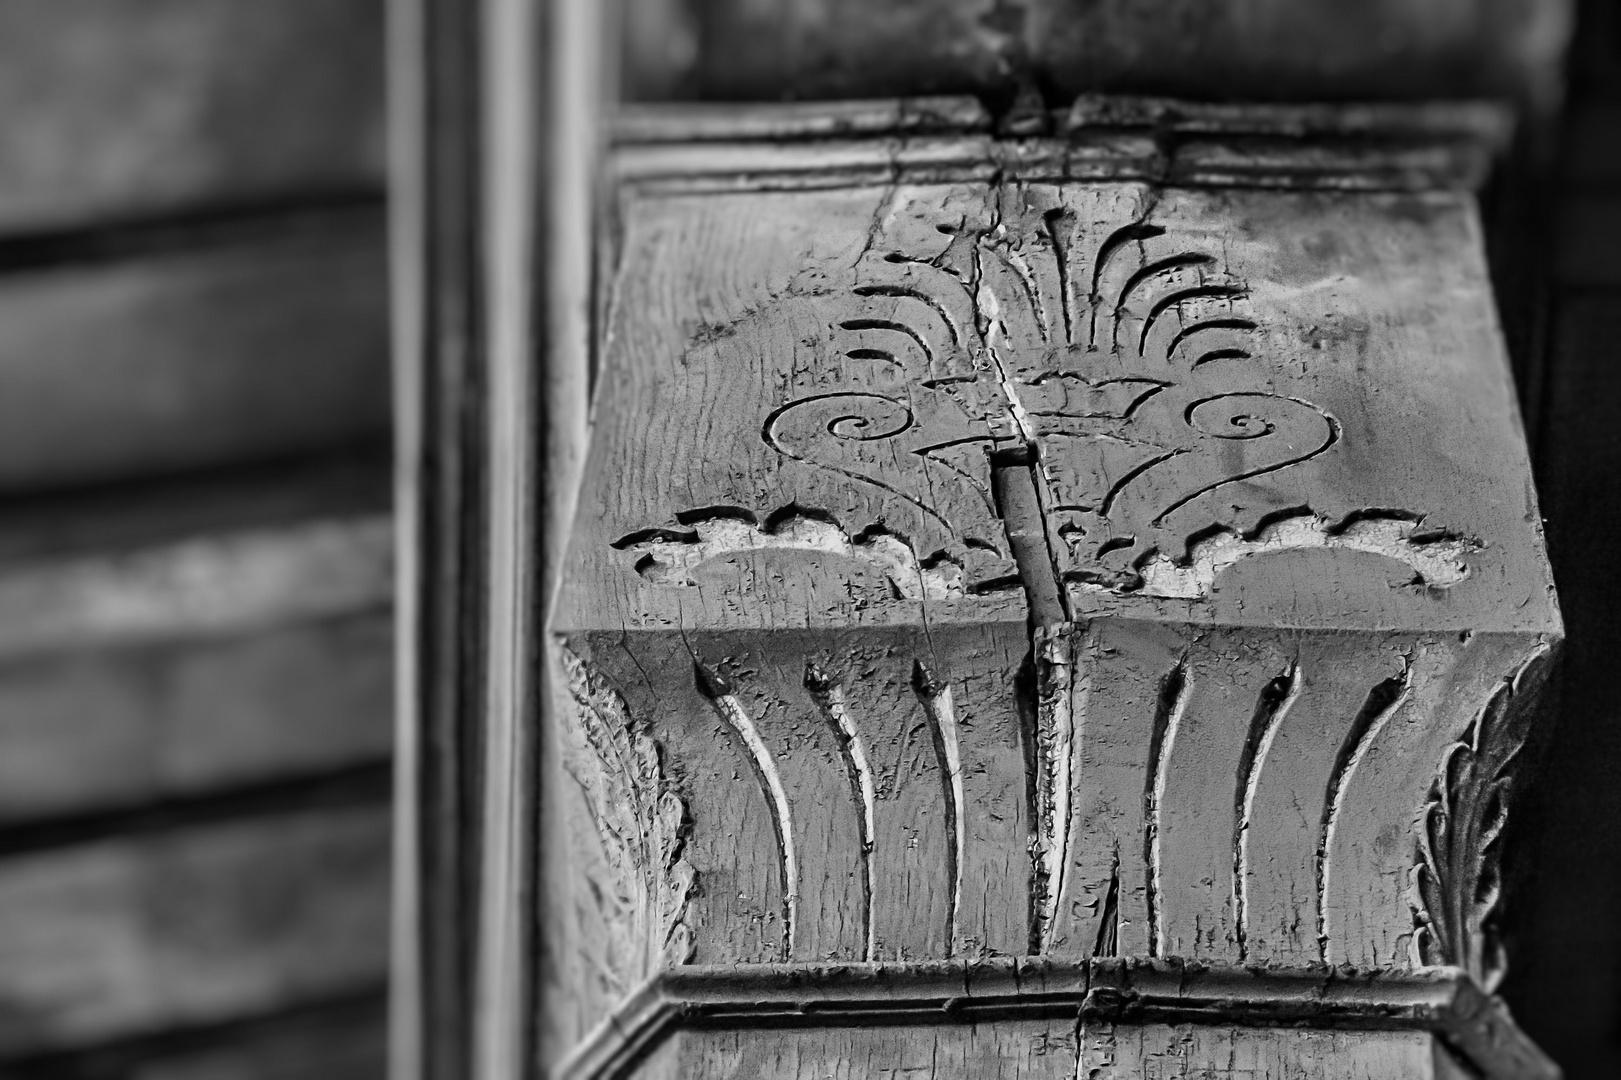 Denkmalschutz Holz VII - Verzierter Balkenkopf